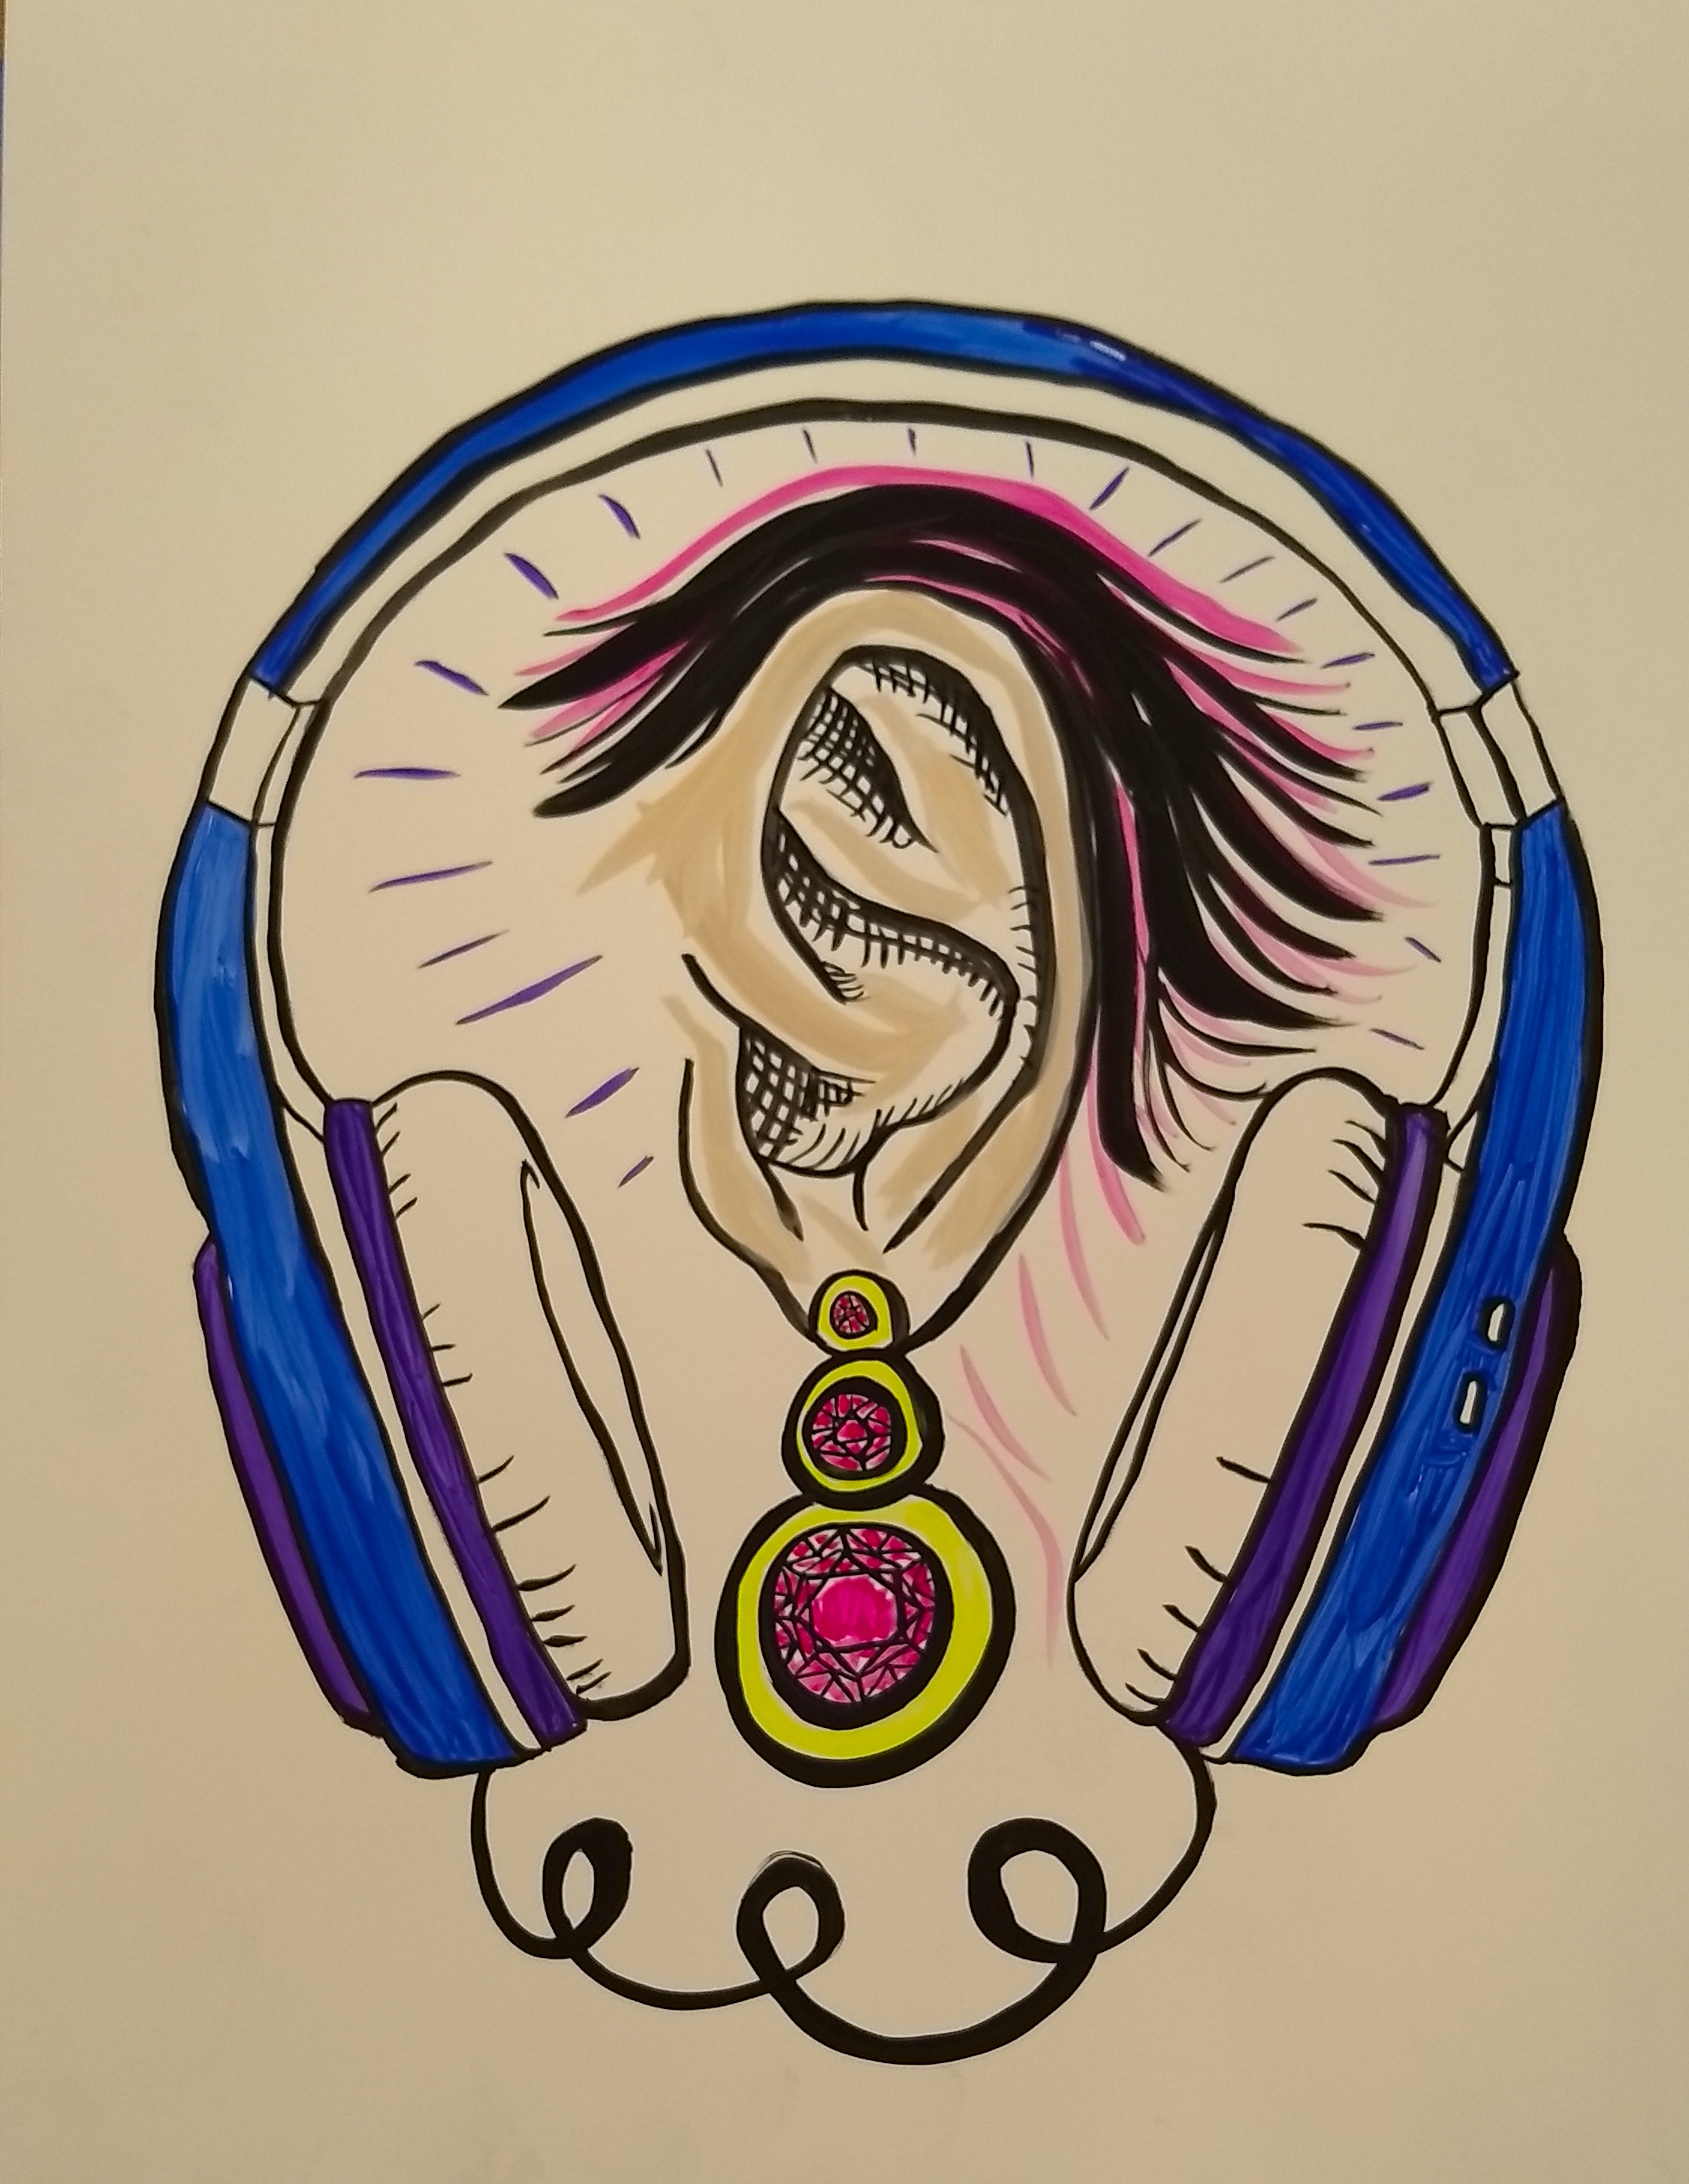 Ear and Headphones for Focusrite Novation